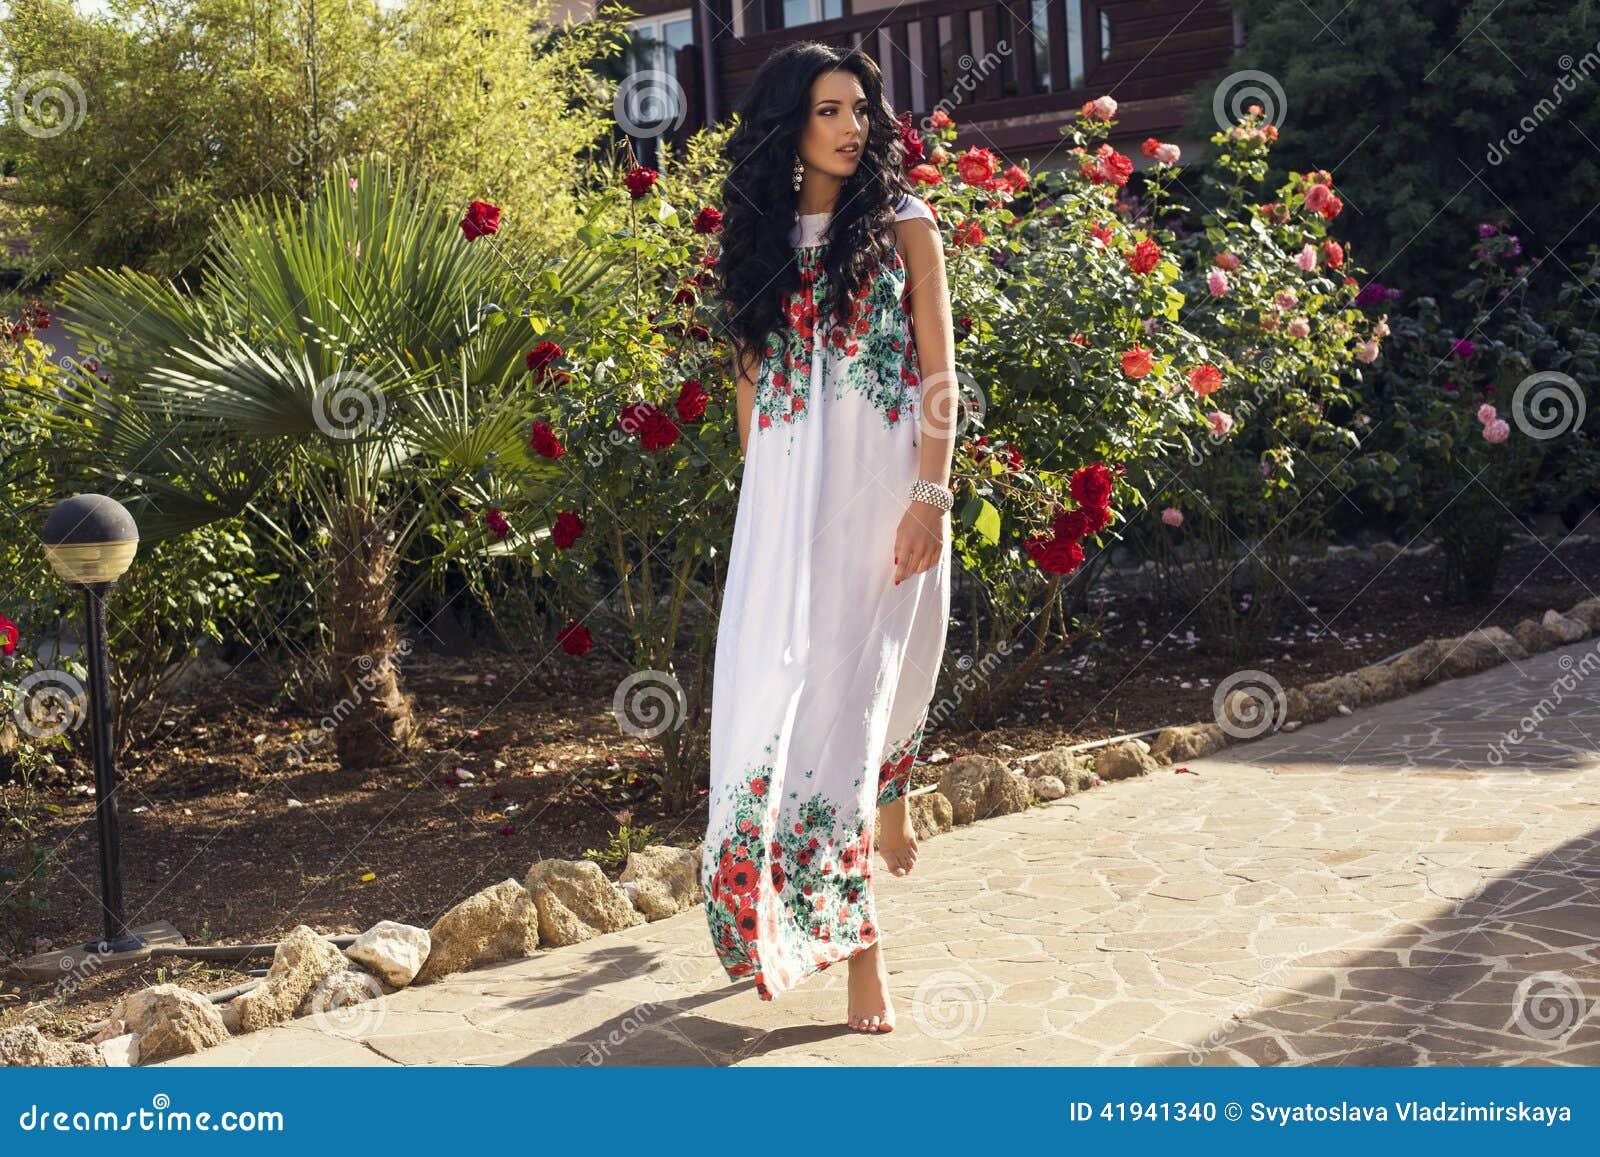 Femme qui cherche gardien villa